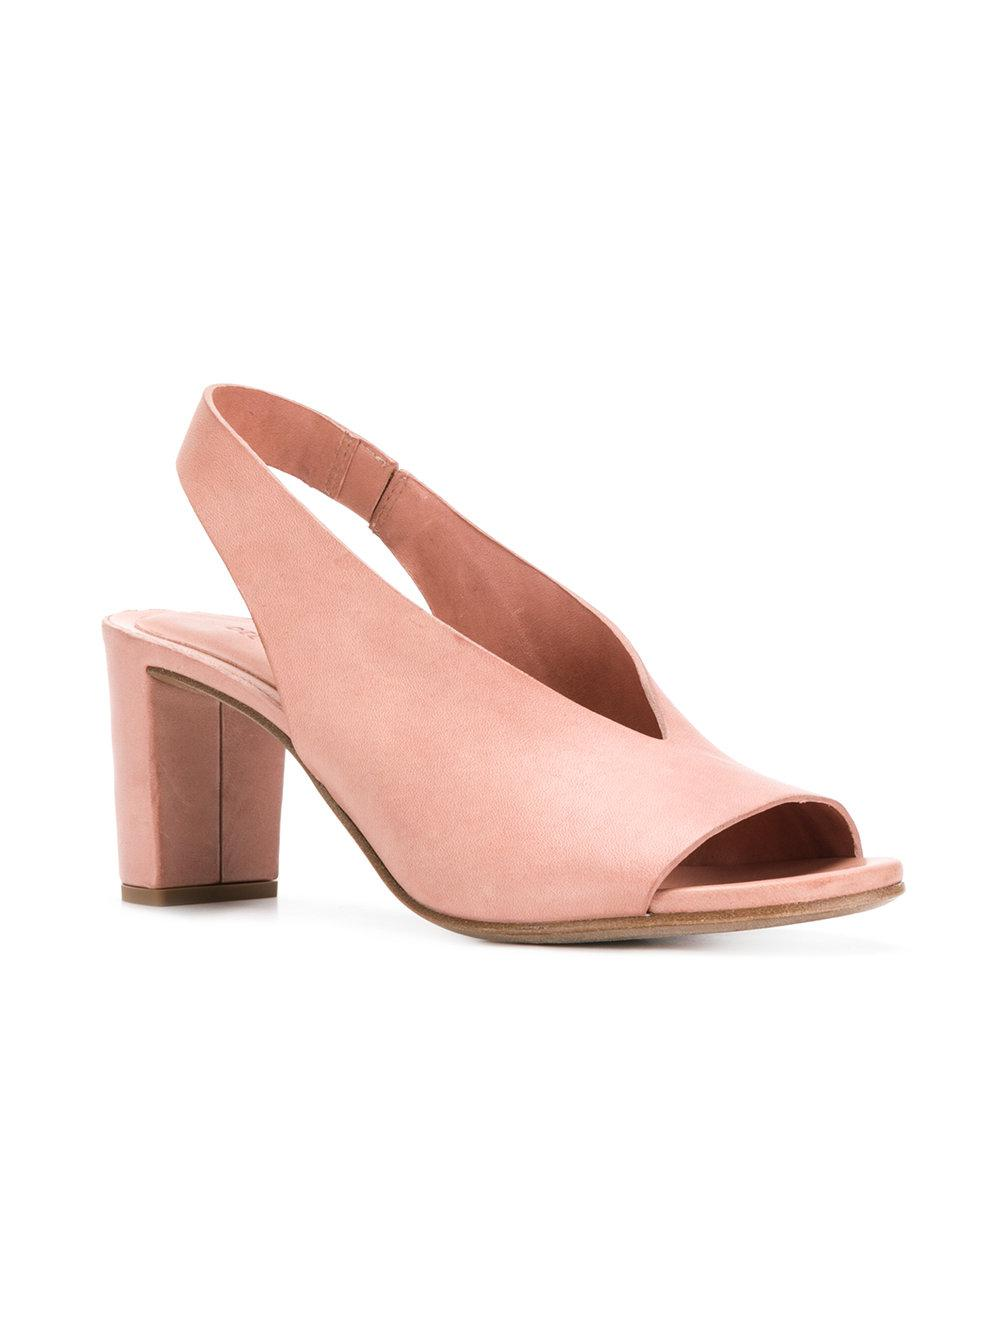 sling back block heel sandals - Pink & Purple Del Carlo 6zLt1